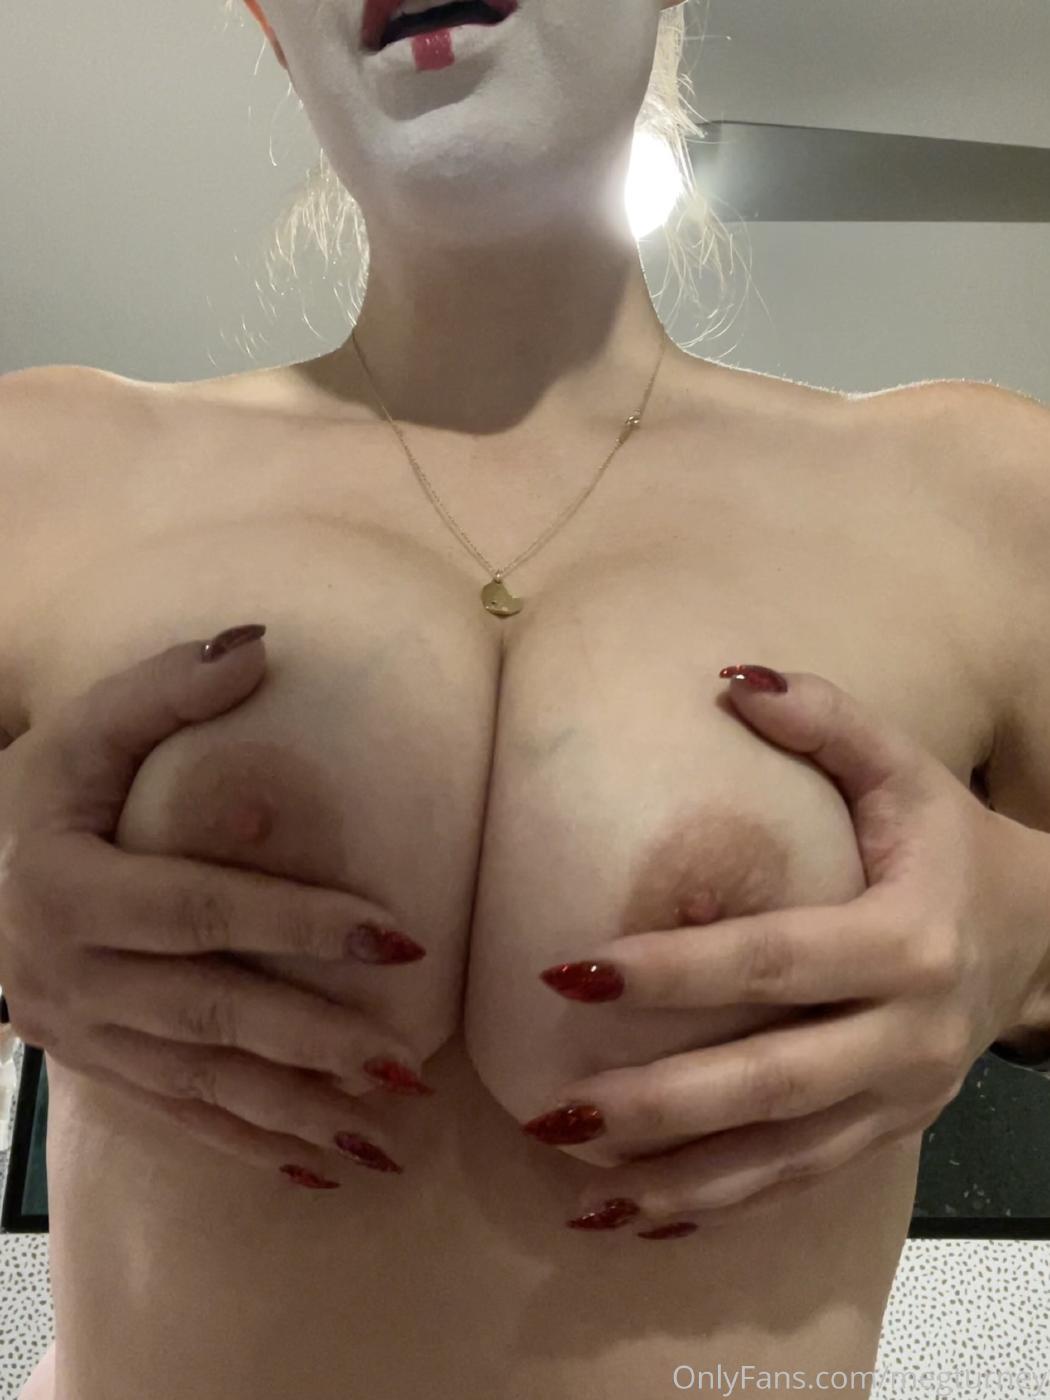 Meg Turney Topless Candids Onlyfans Set Leaked 0004